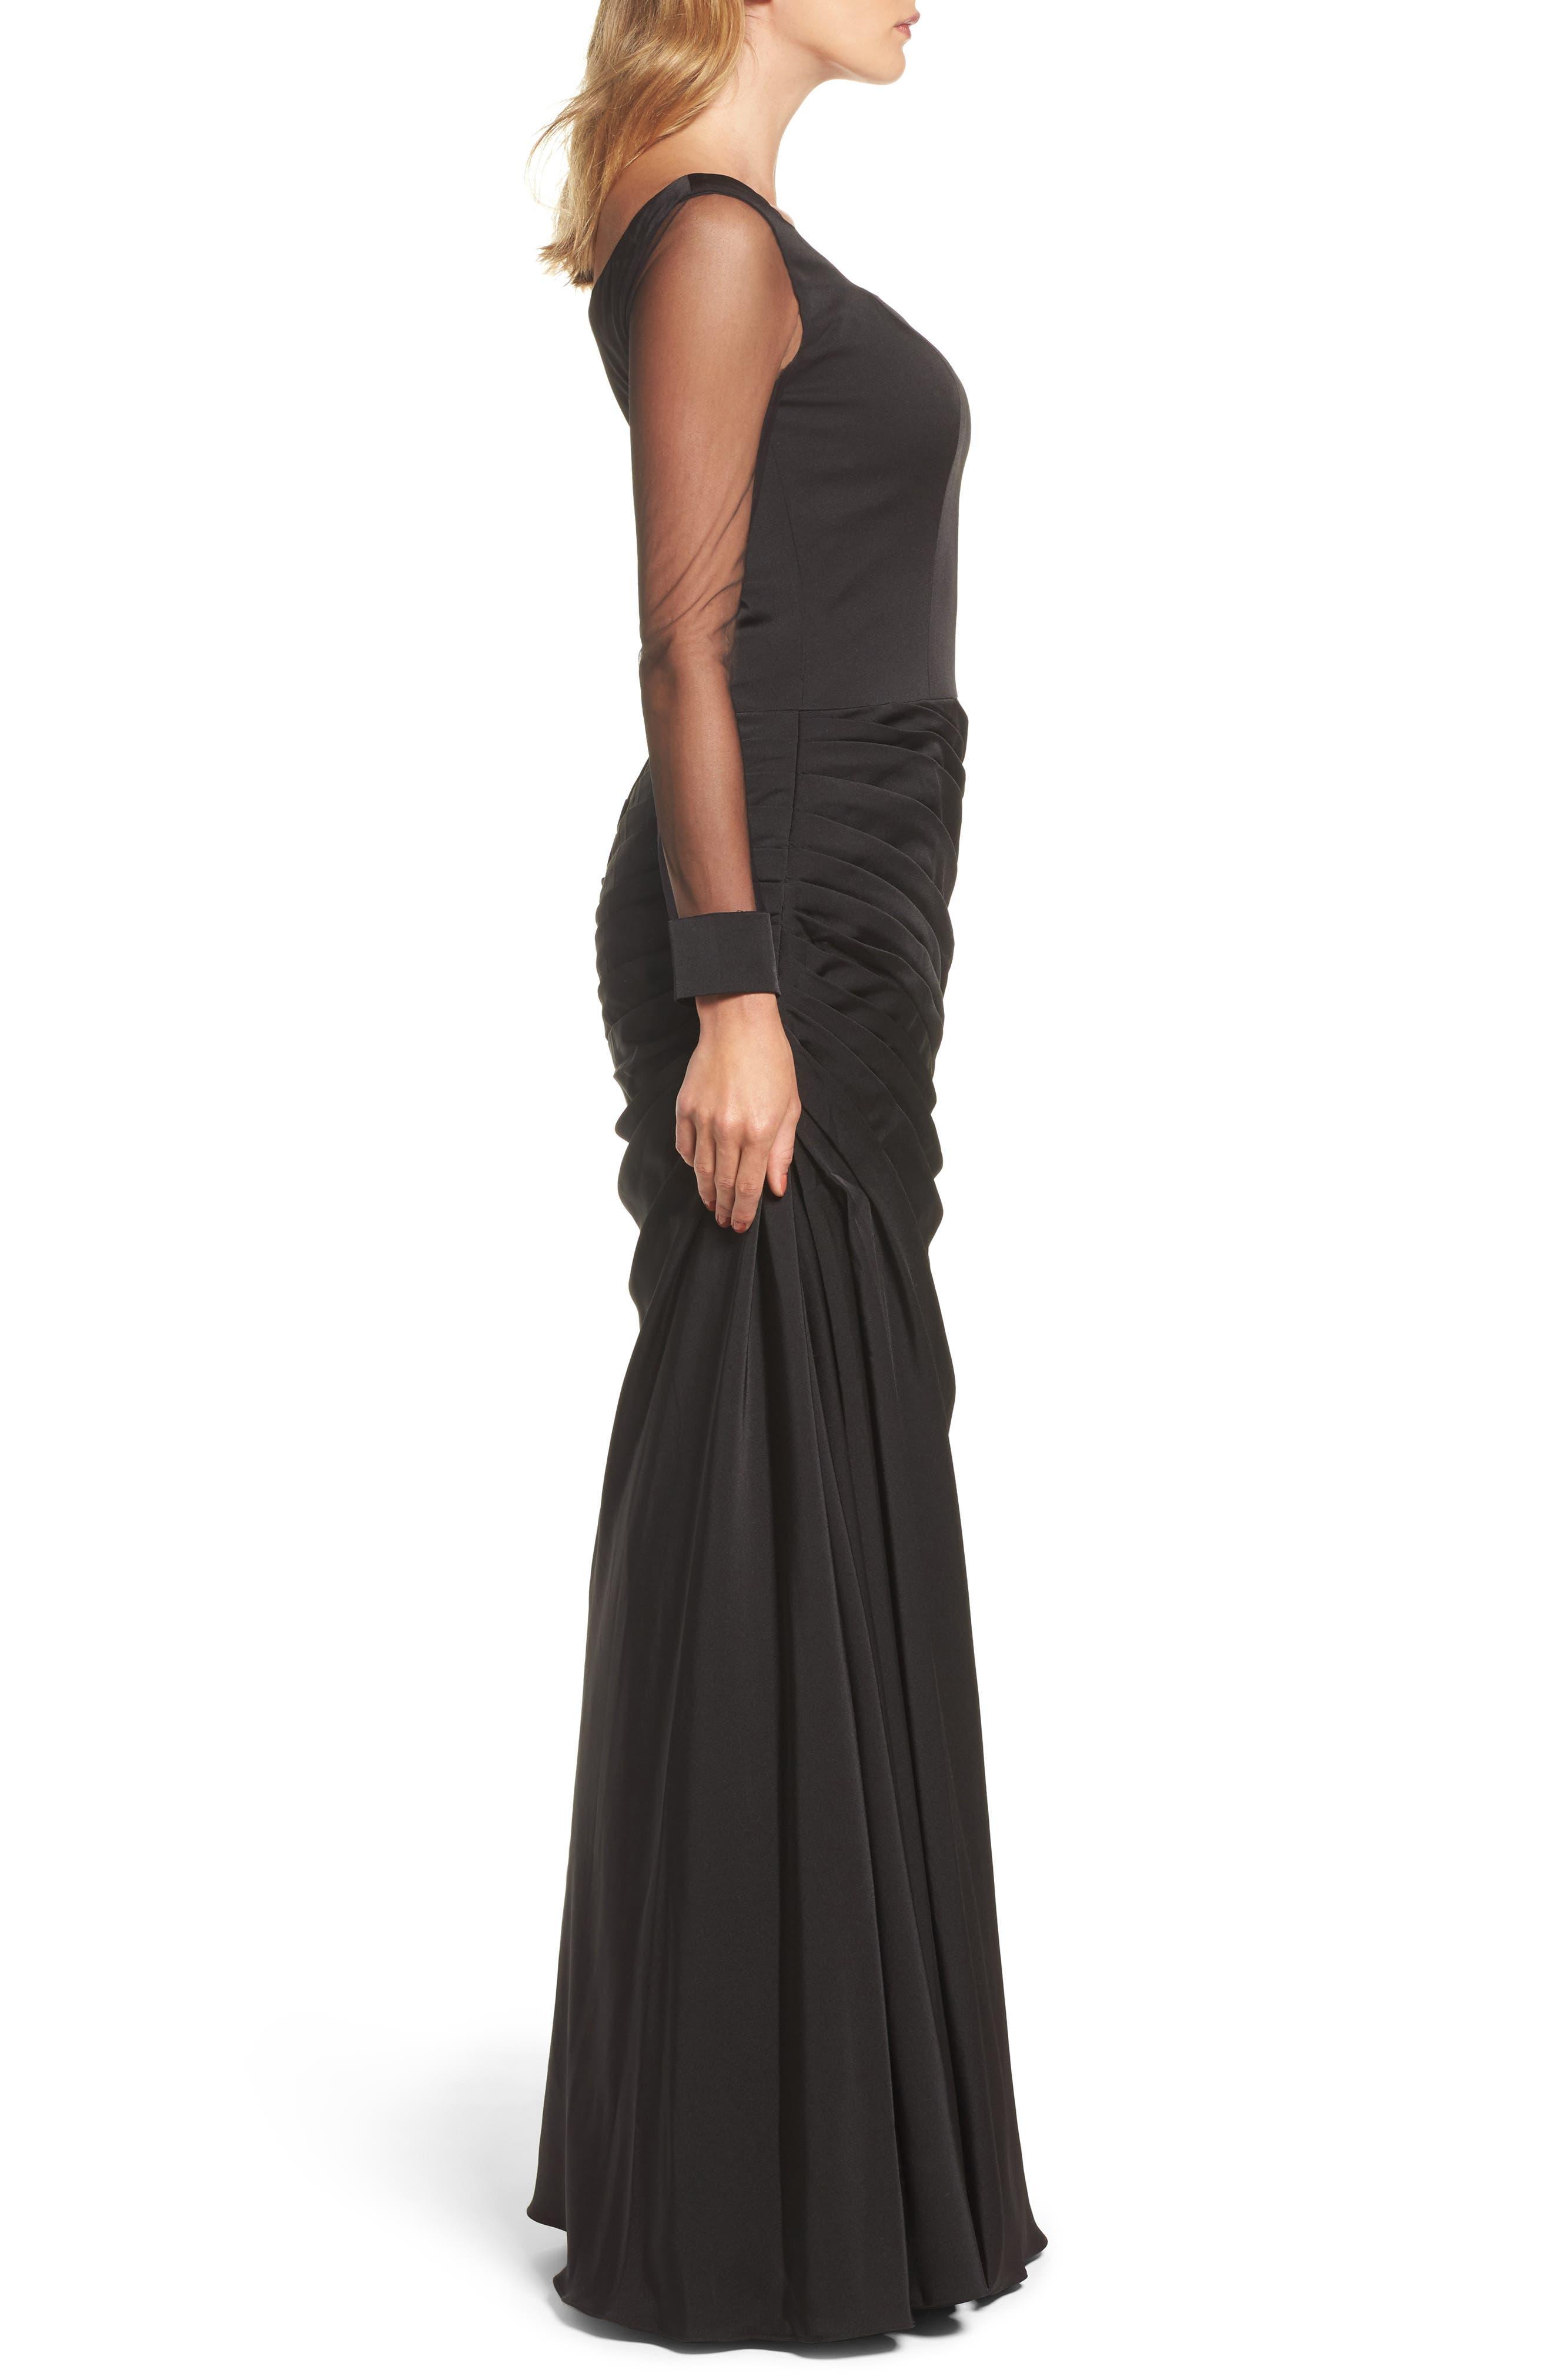 LA FEMME, Sheer Sleeve Gown, Alternate thumbnail 3, color, BLACK